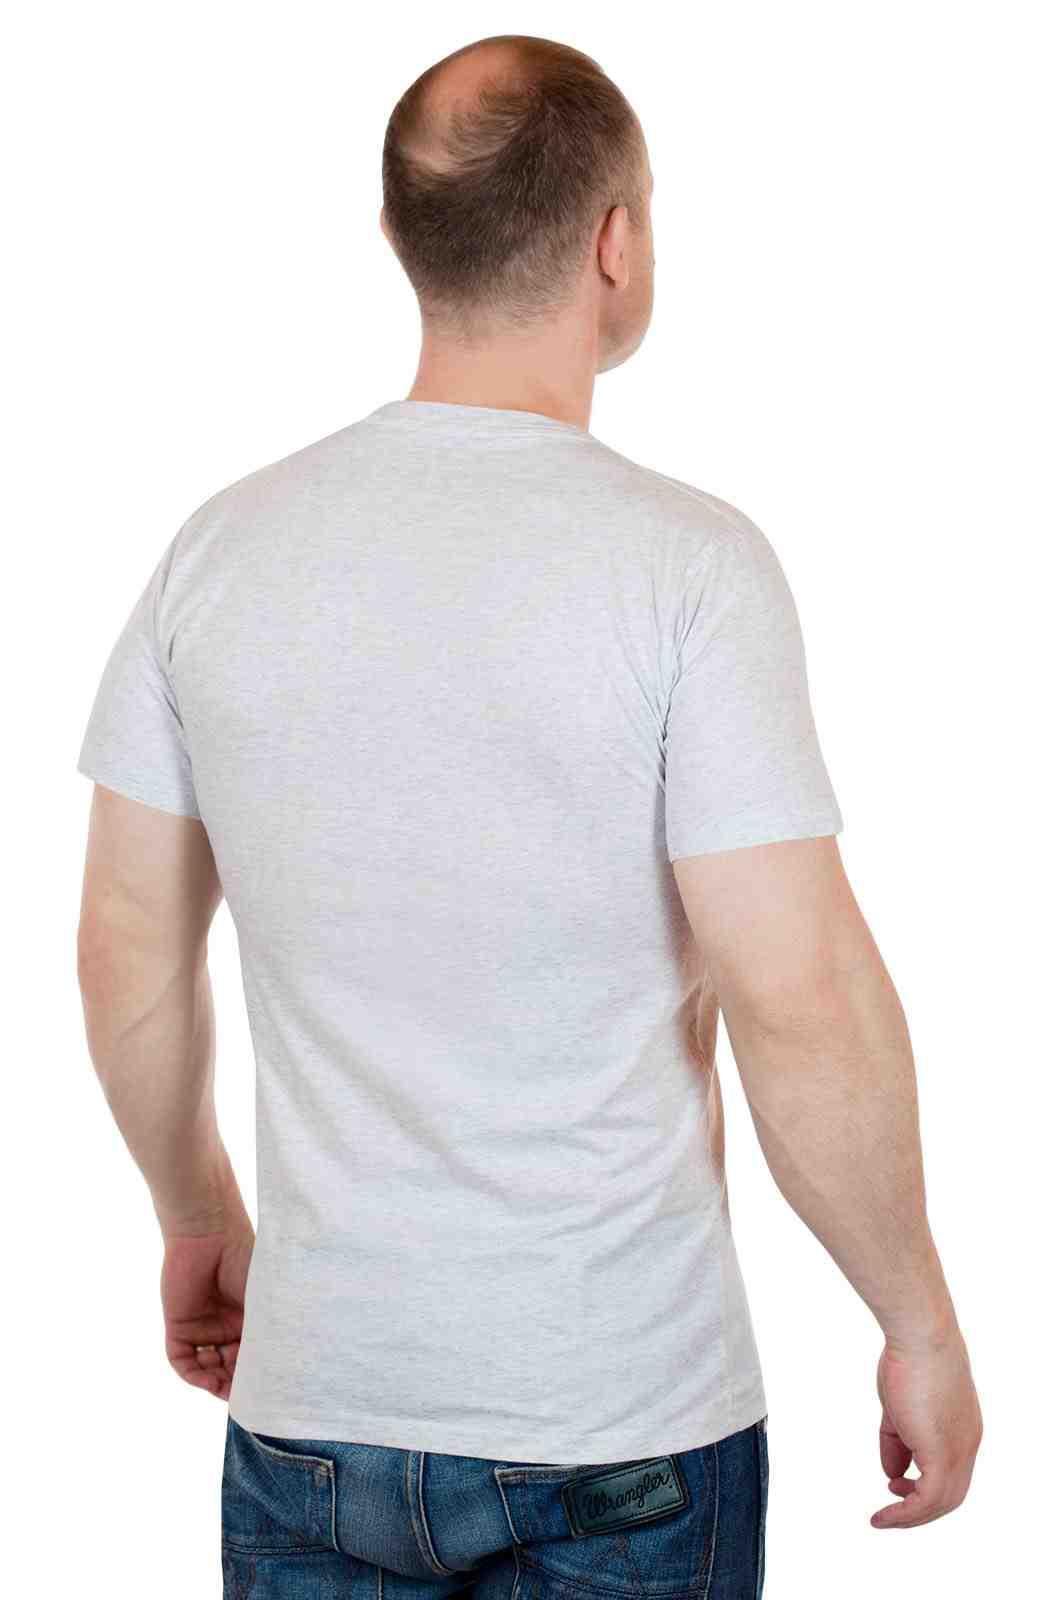 Мужская футболка от Academy - американский тренд-сзади